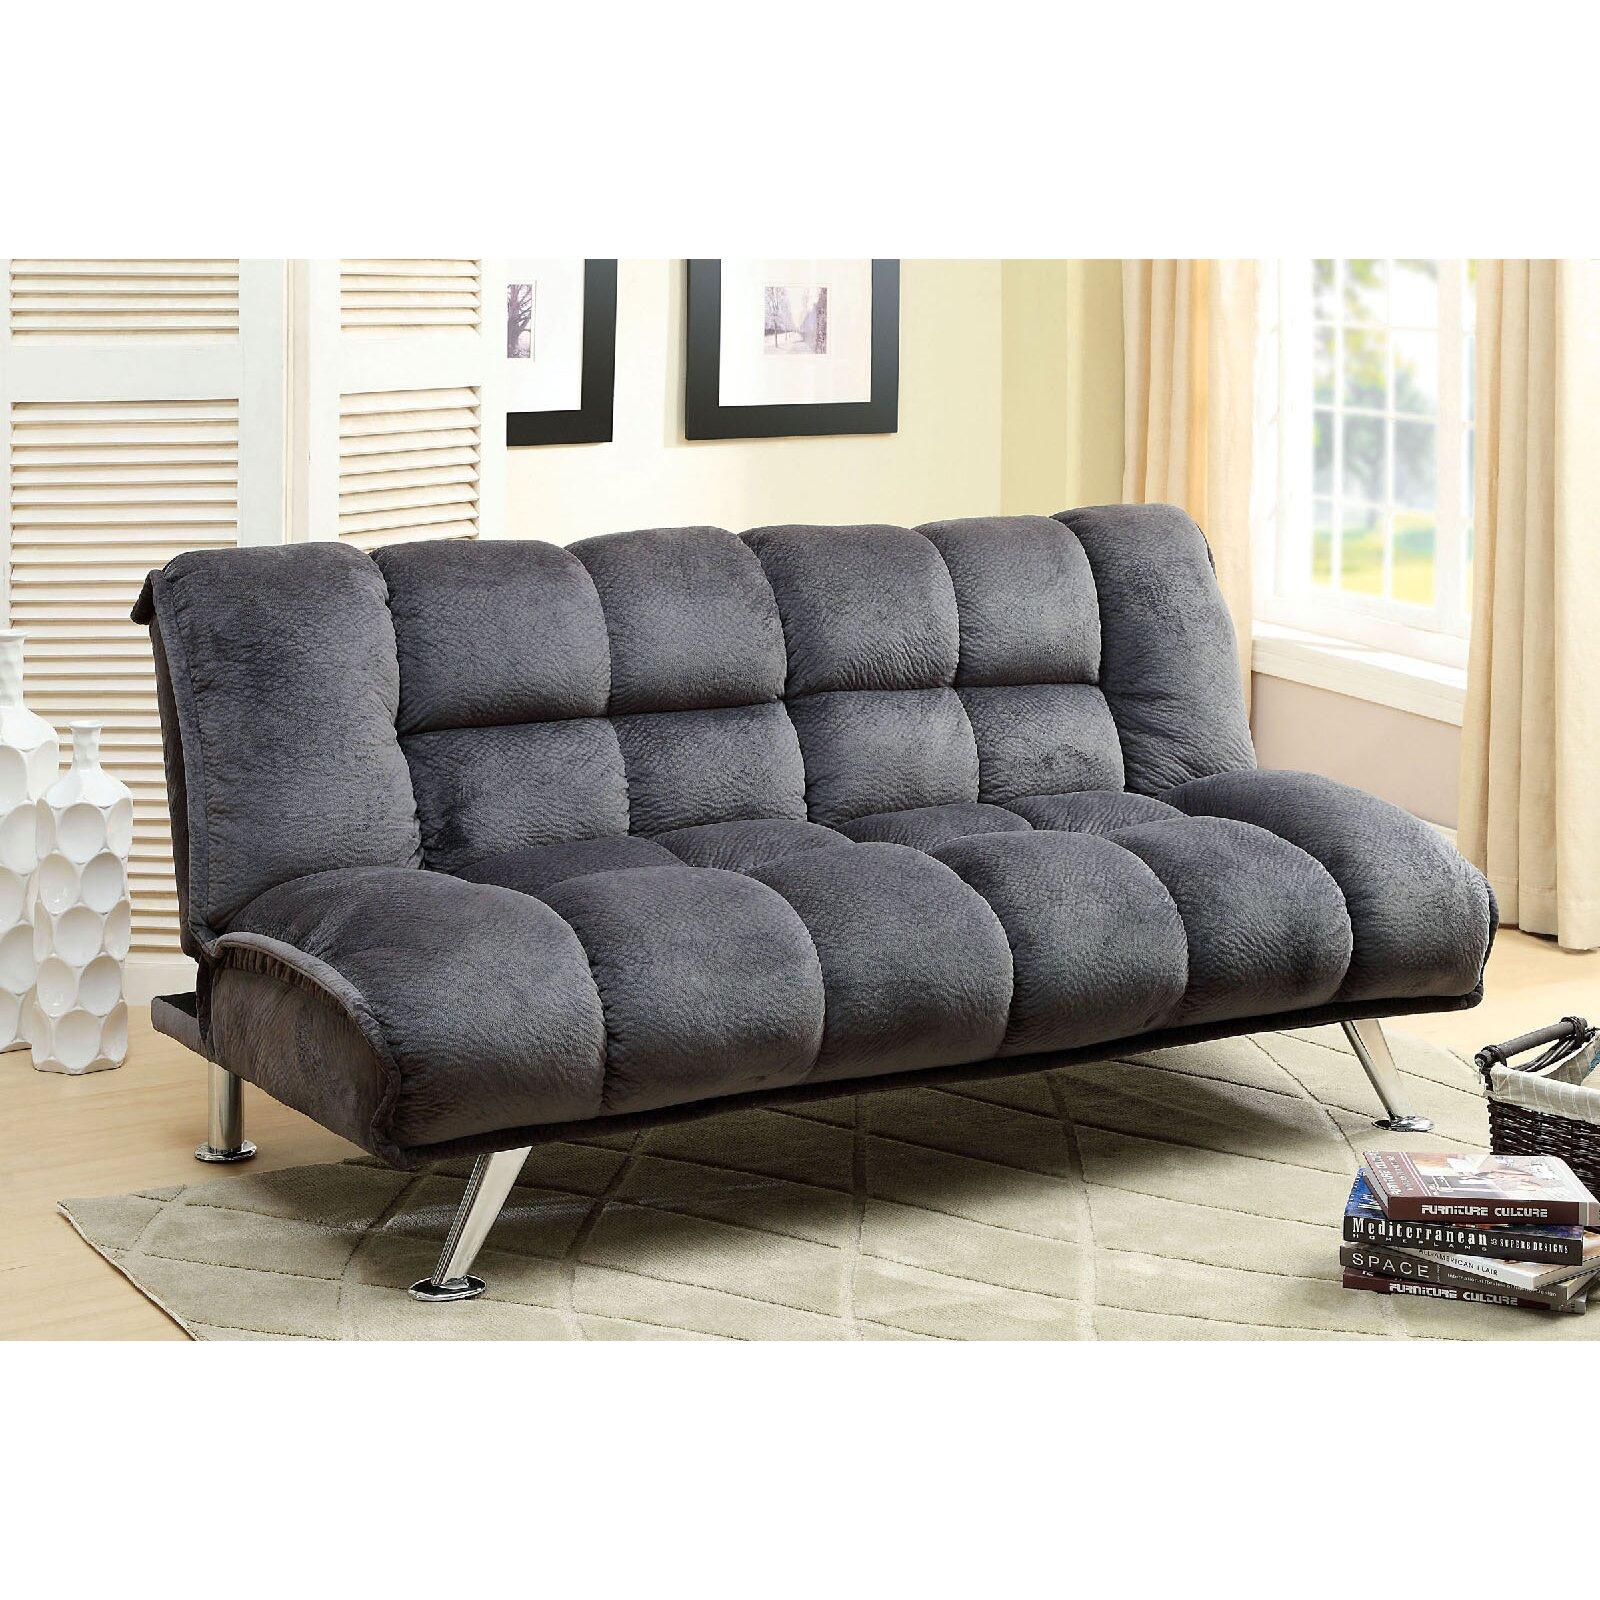 A J Homes Studio Lauren Tufted Futon Sleeper Sofa